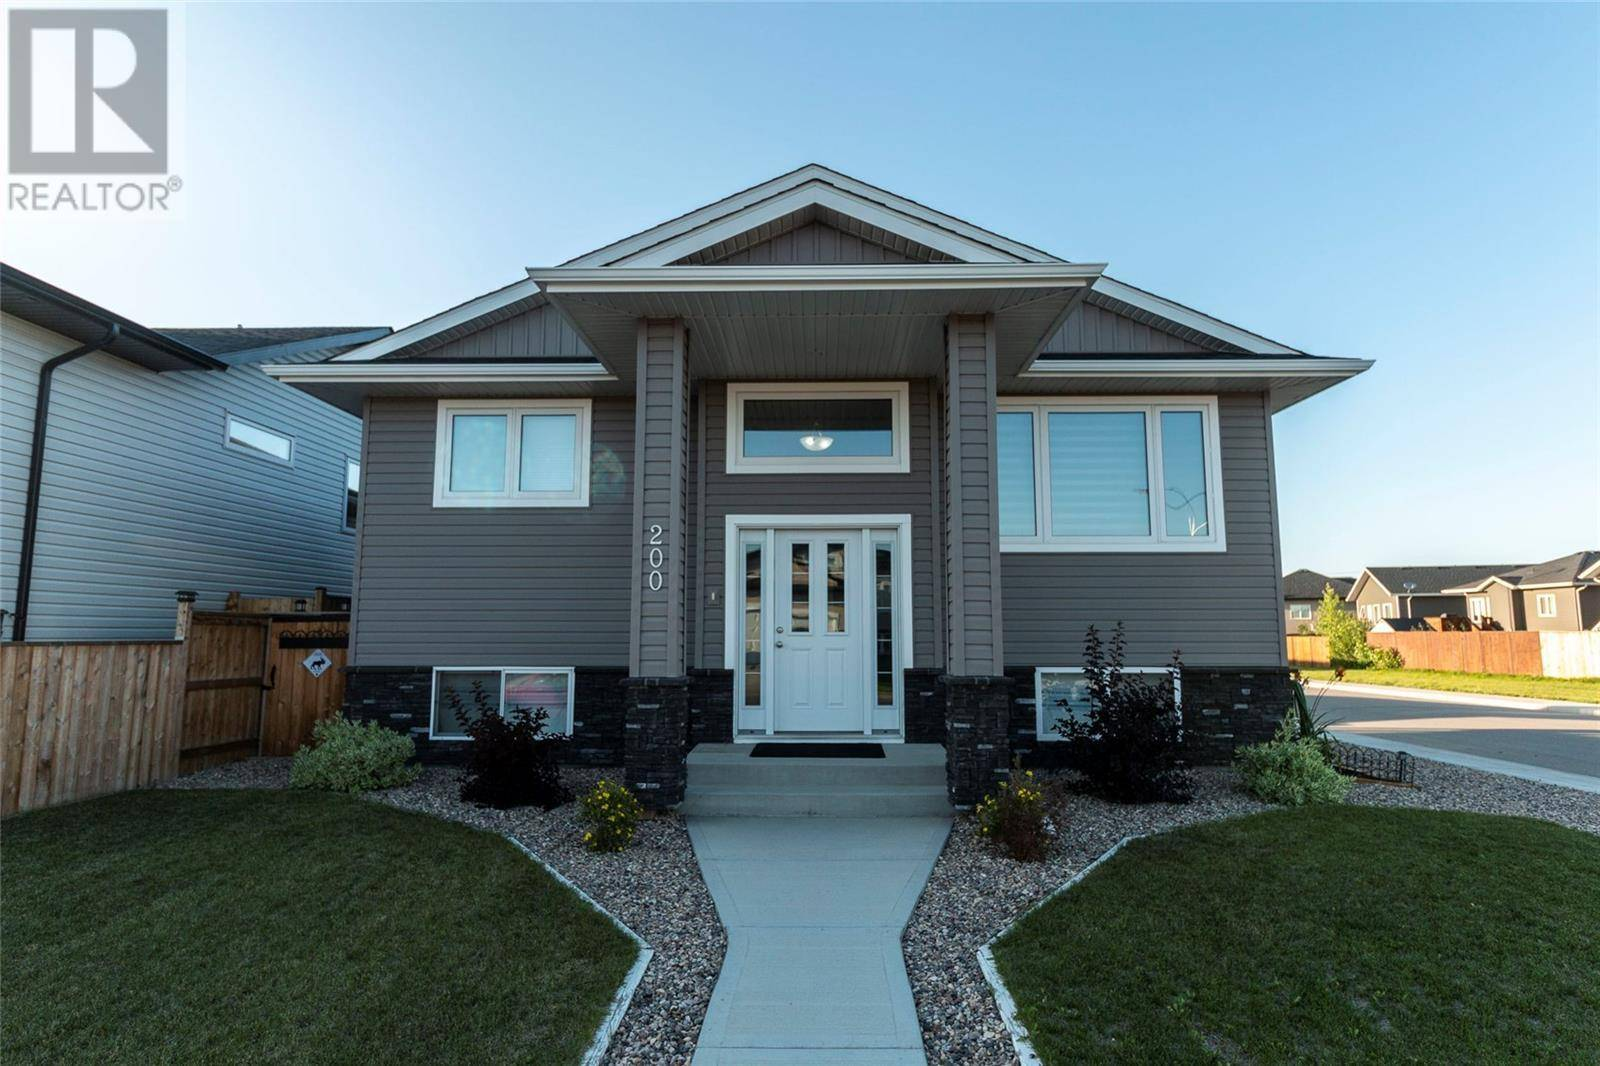 House for sale at 200 Reddekopp Ln Warman Saskatchewan - MLS: SK781855